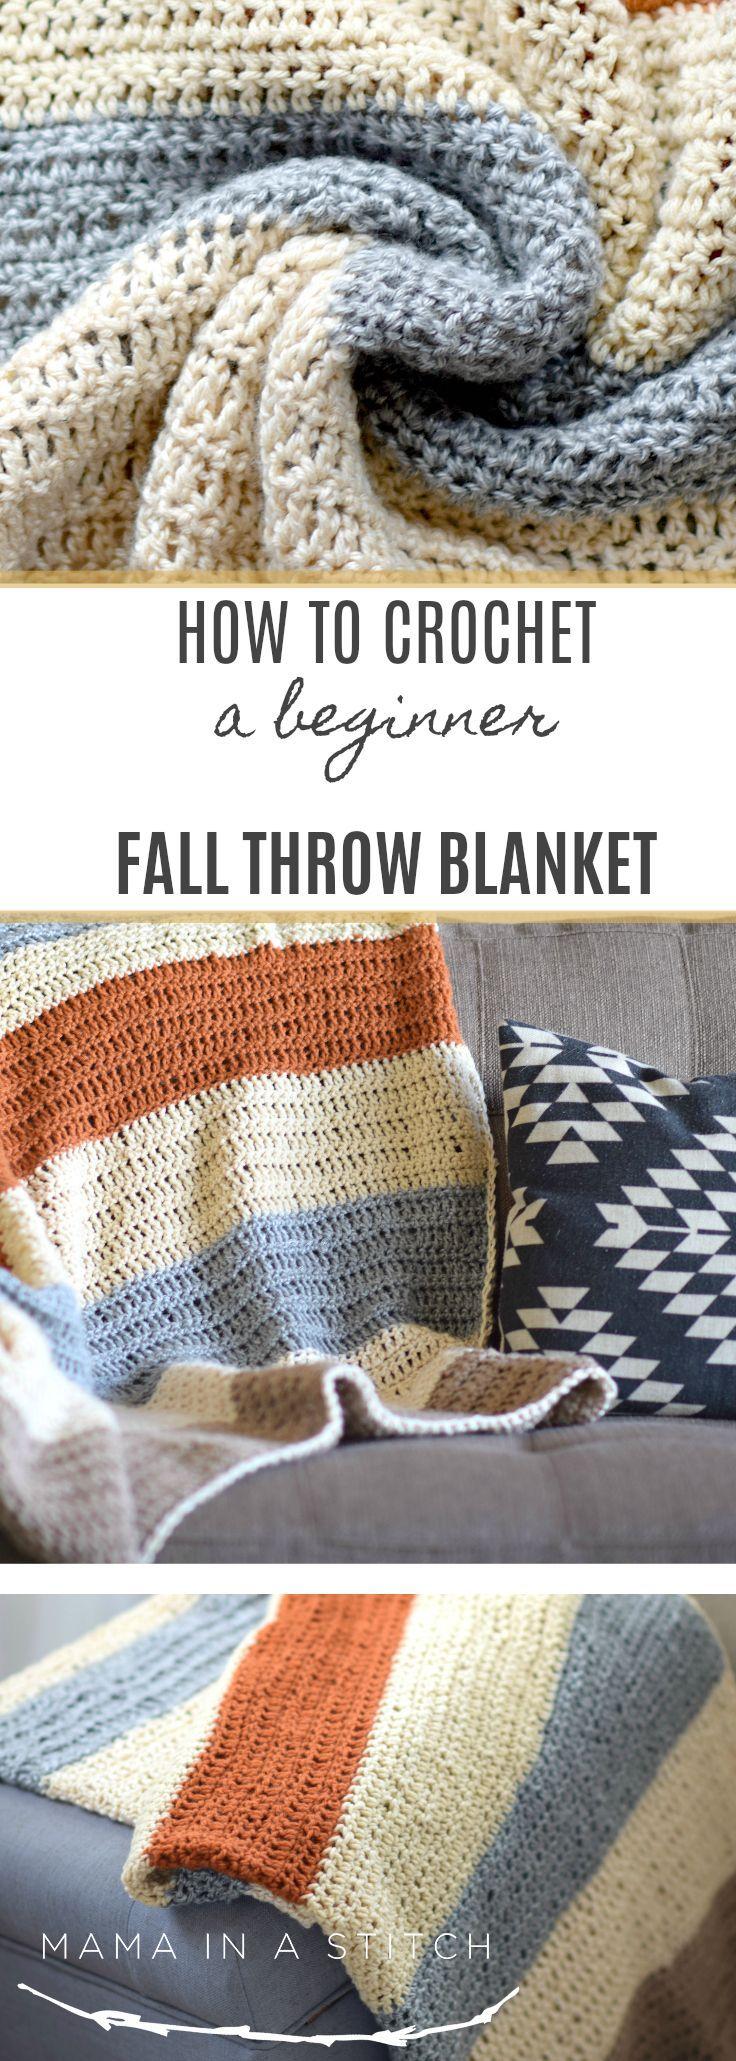 How To Crochet A Beginner Fall Throw Blanket – Dec…